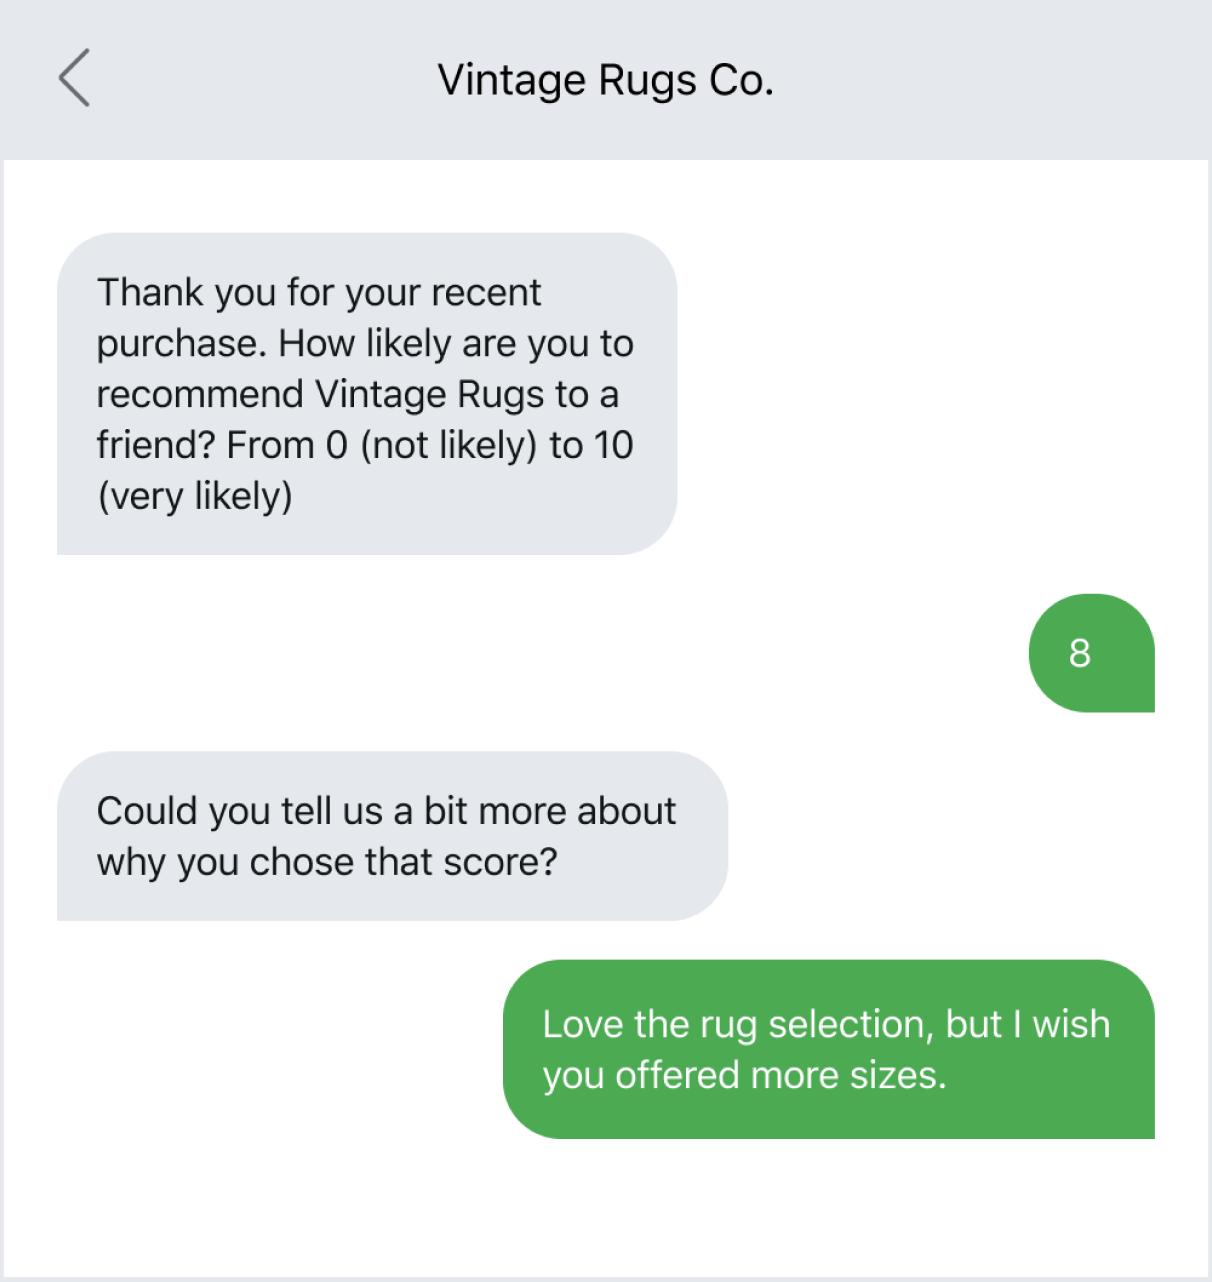 Sending an NPS survey at a customer milestone